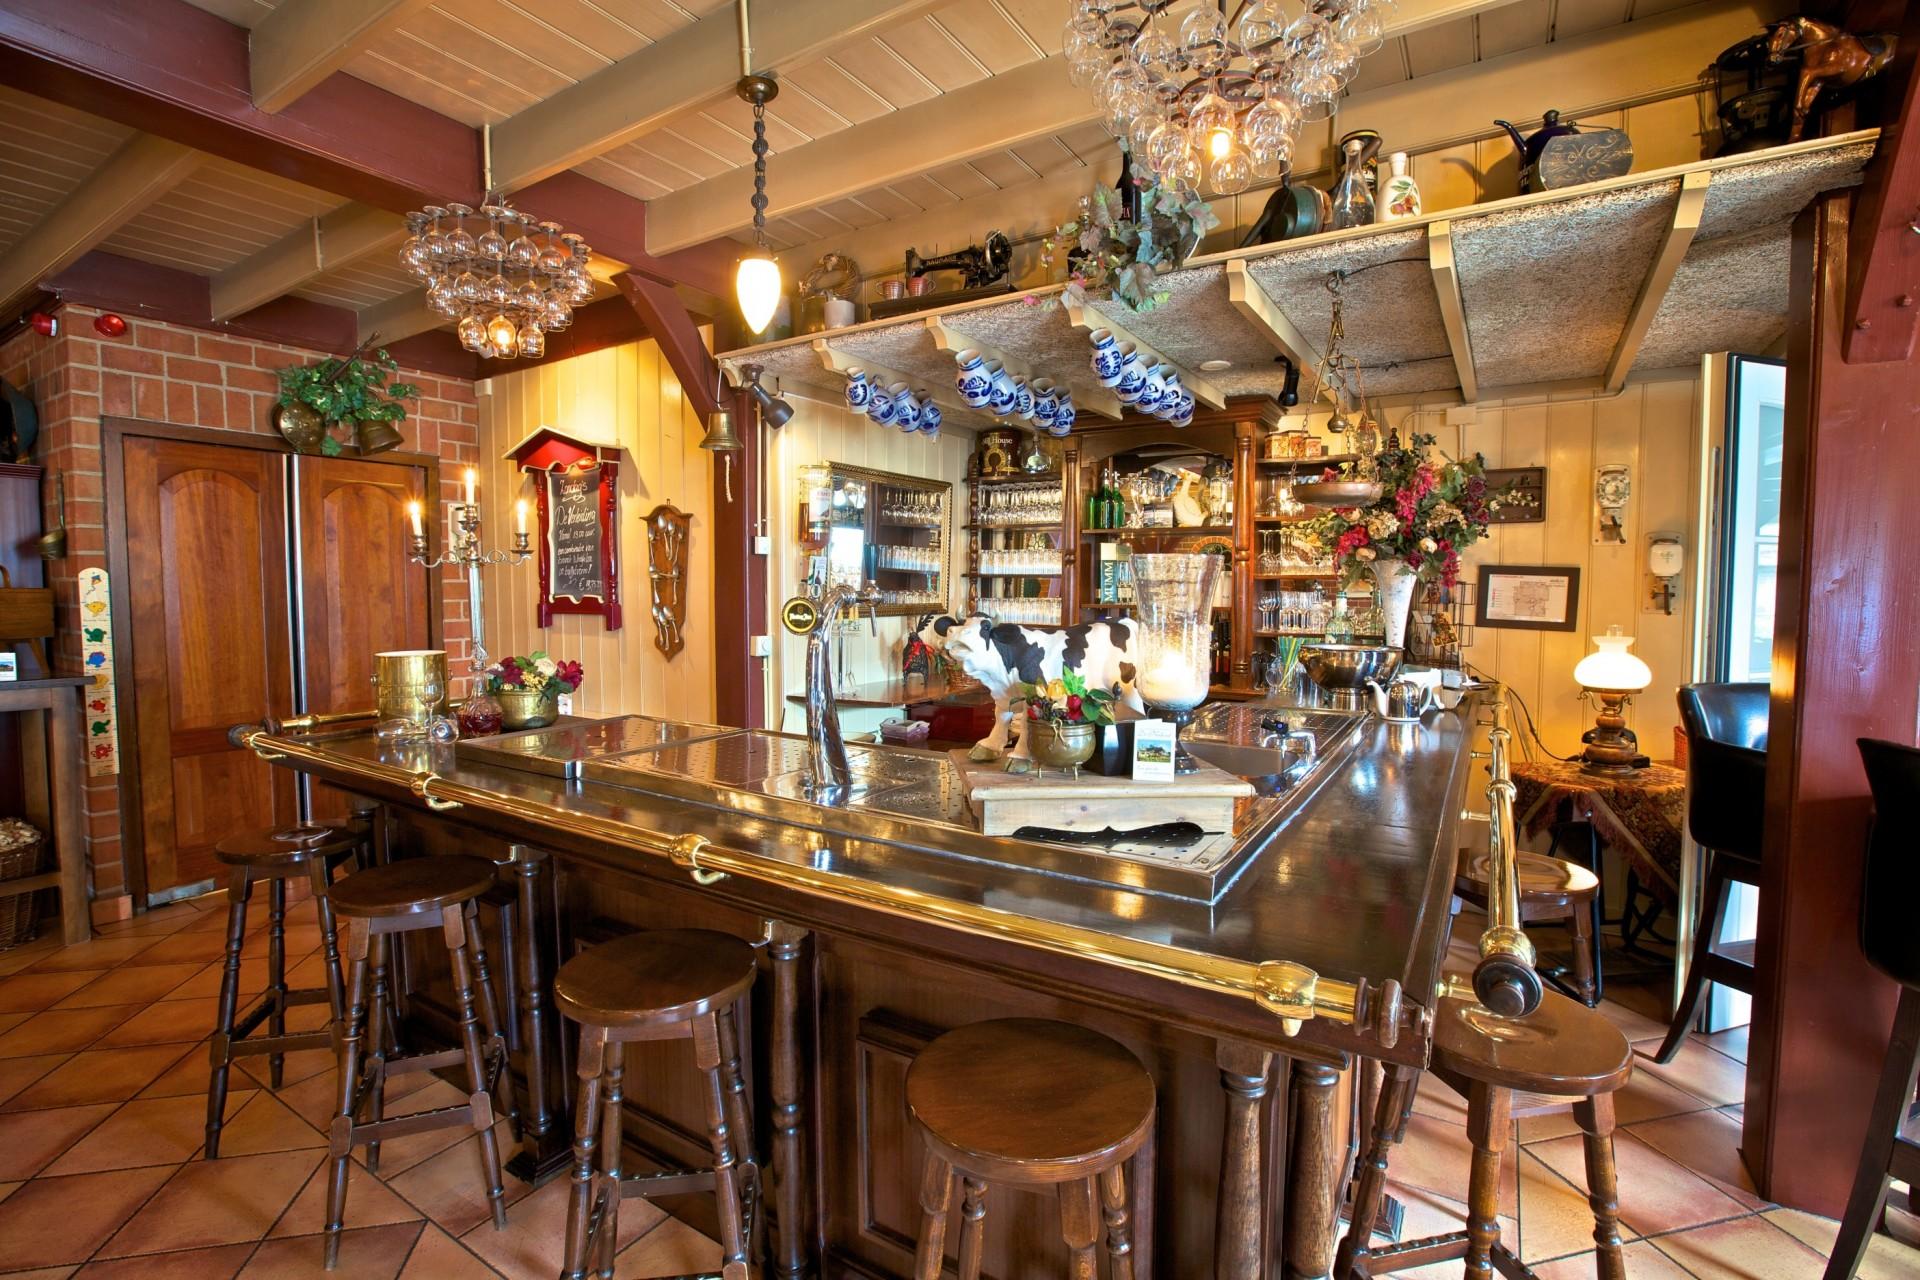 Nadorst-restaurant-uitspanning-faciliteiten-pronckkamer-2